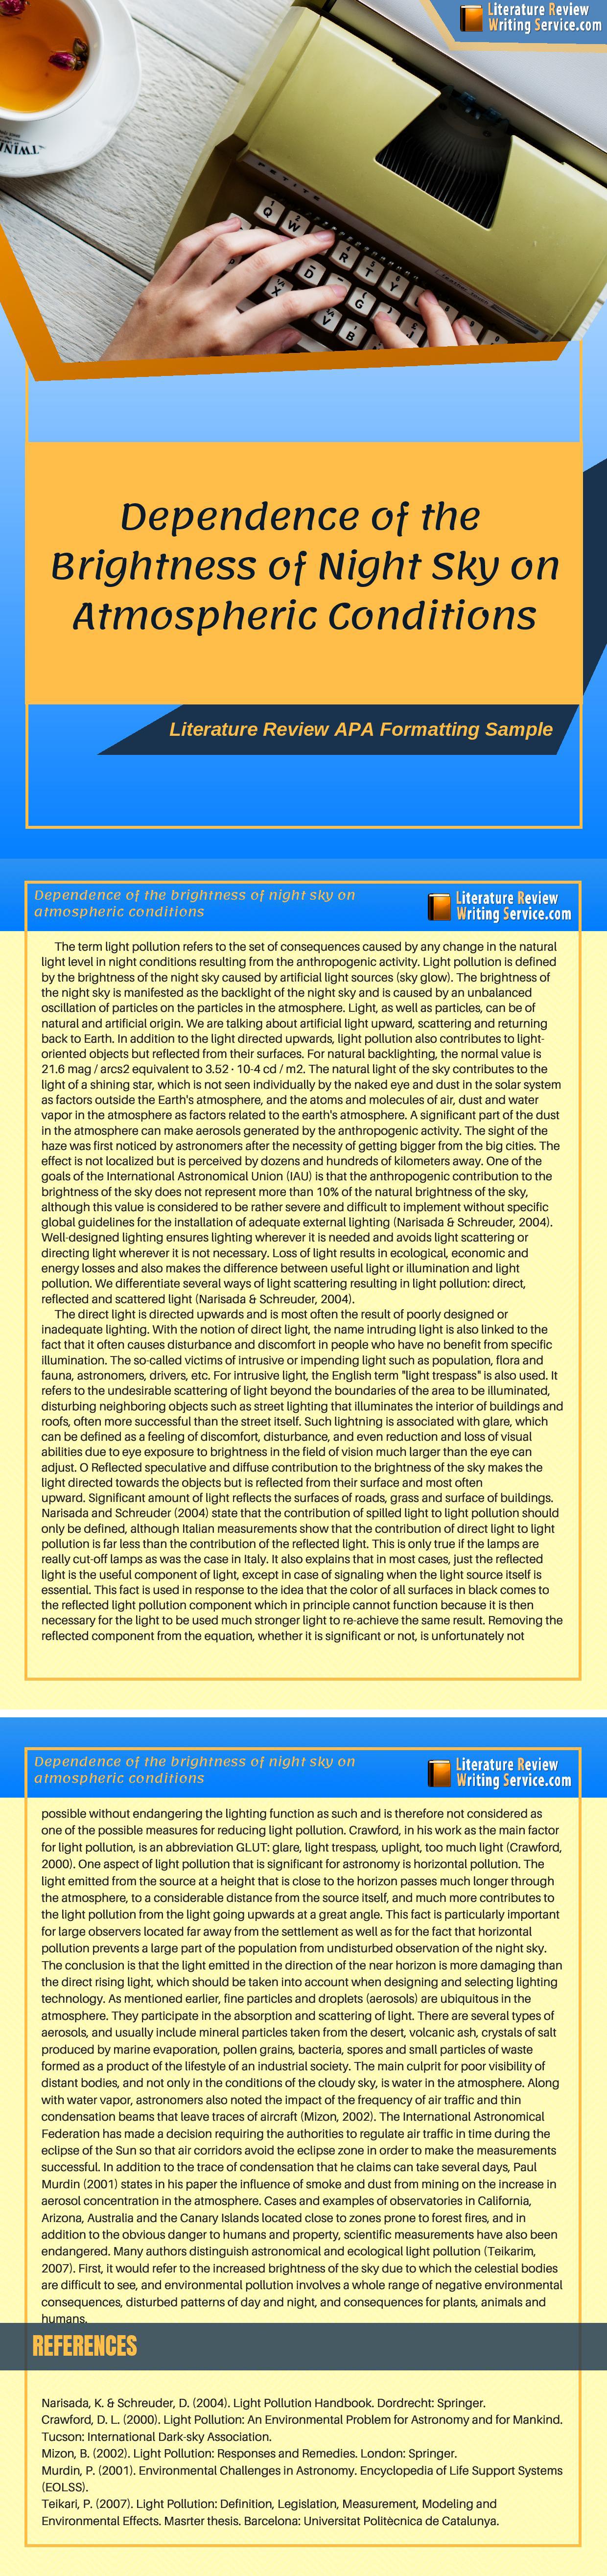 literature review apa formatting httpswww